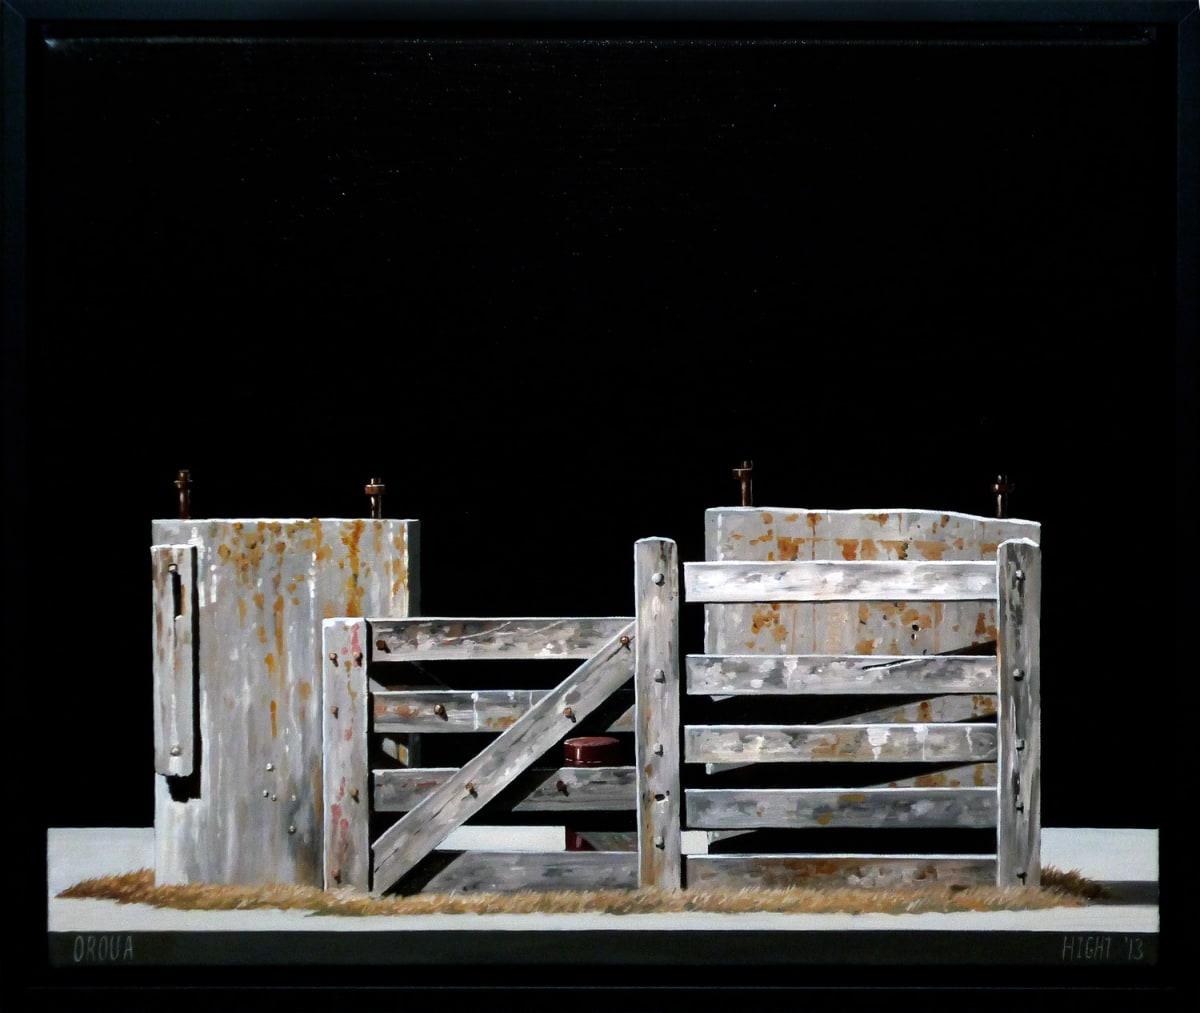 Michael Hight Oroua, 2013 Oil on linen 14 x 16.1 in 35.5 x 41 cm